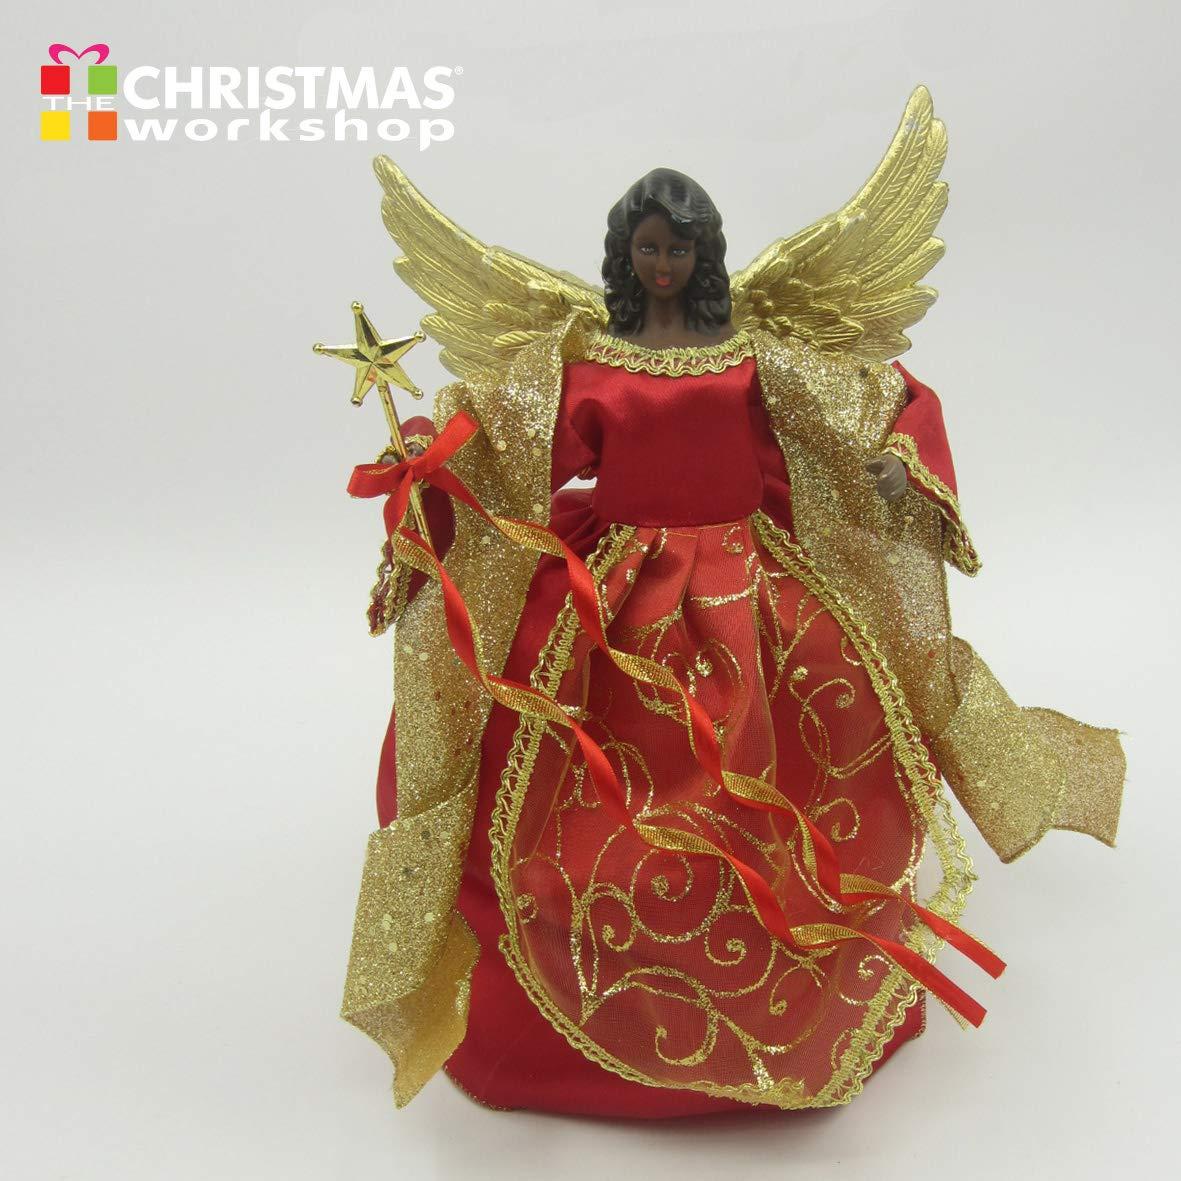 The Christmas Workshop Ange pour Sommet de Sapin